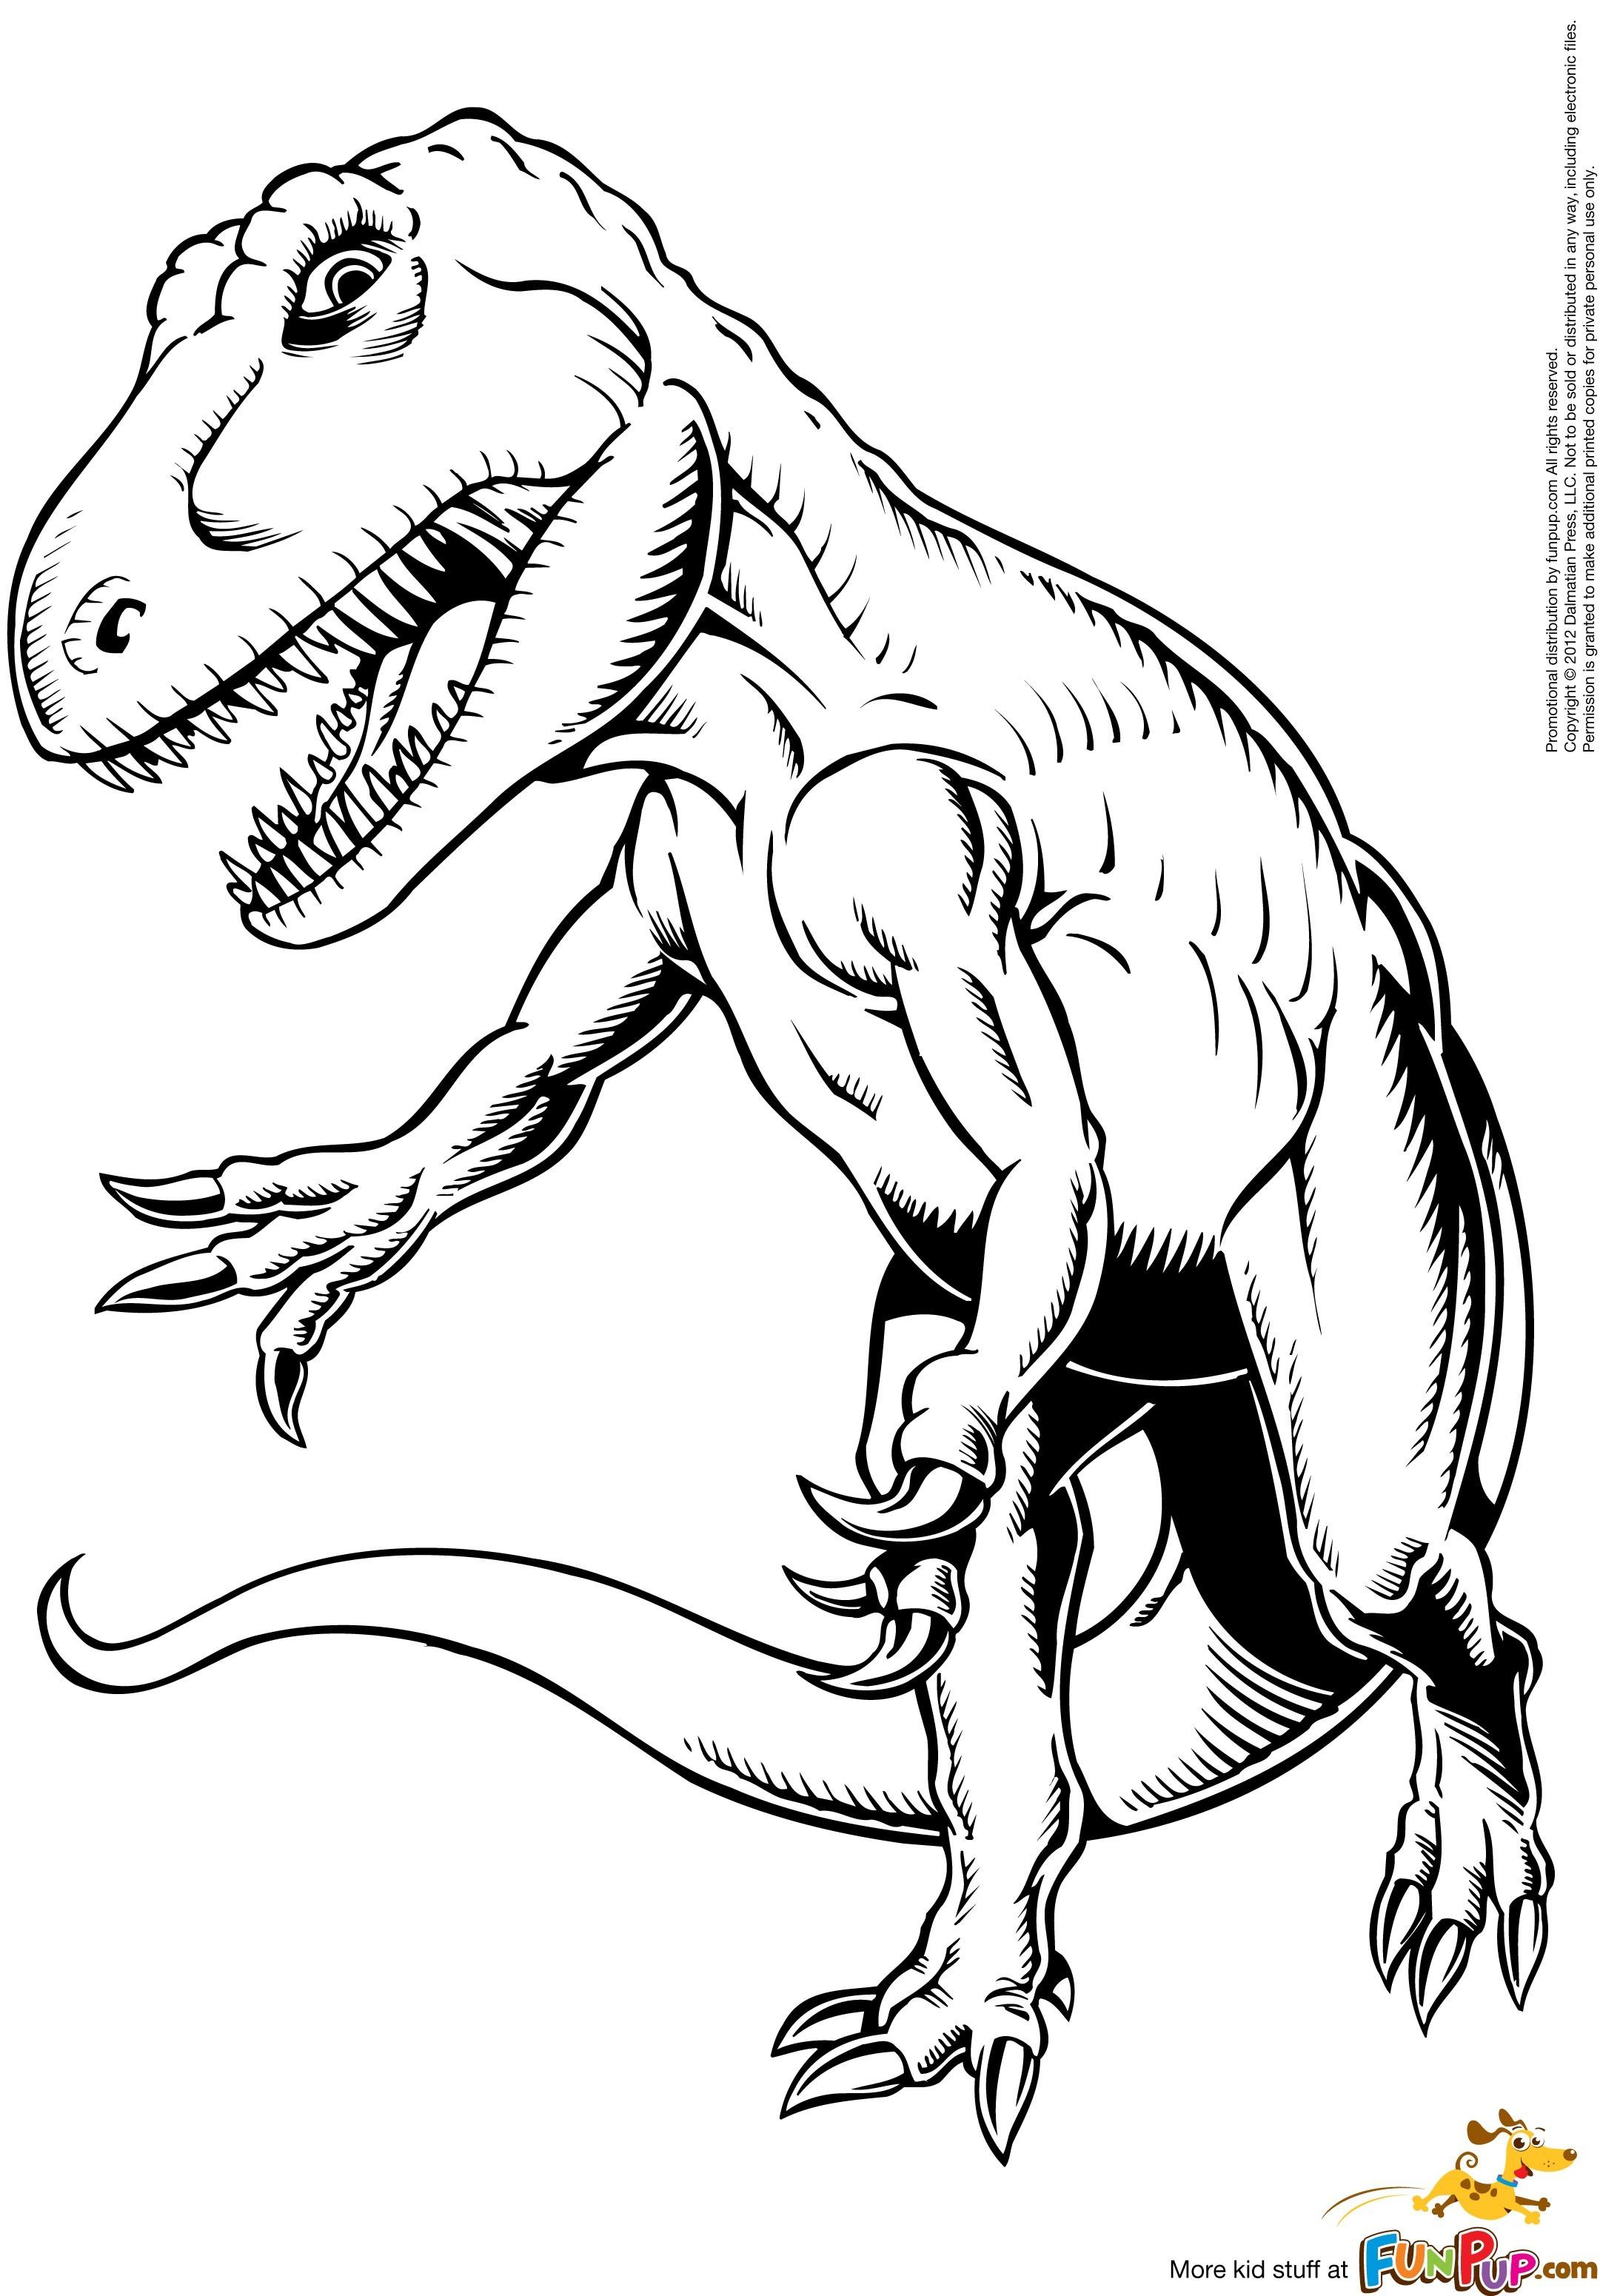 dinosaur t rex drawing at getdrawings   free download